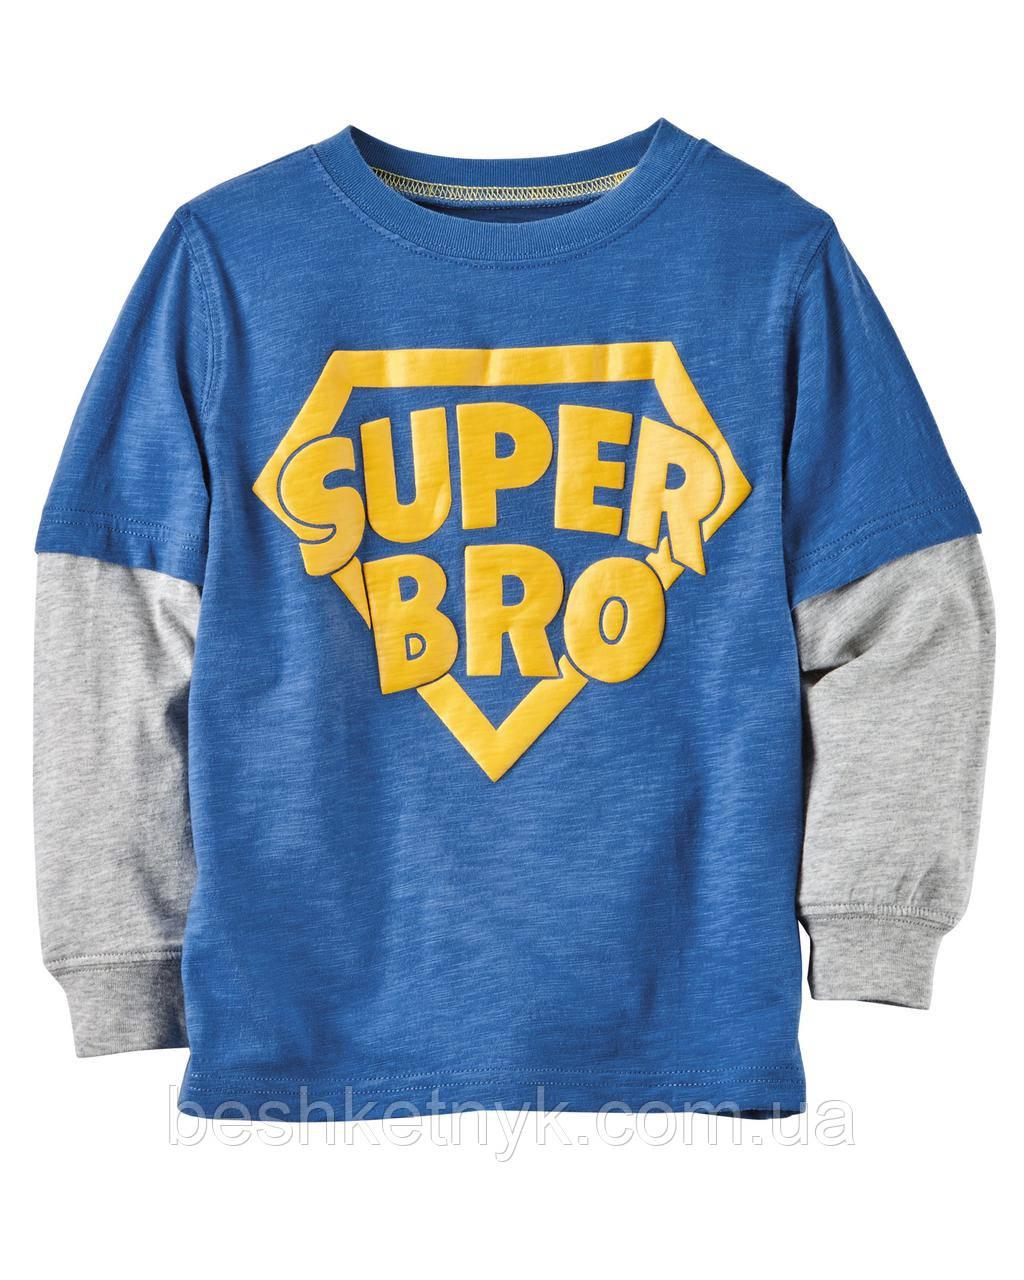 Футболка на довгий рукав Carter's - Super Bro